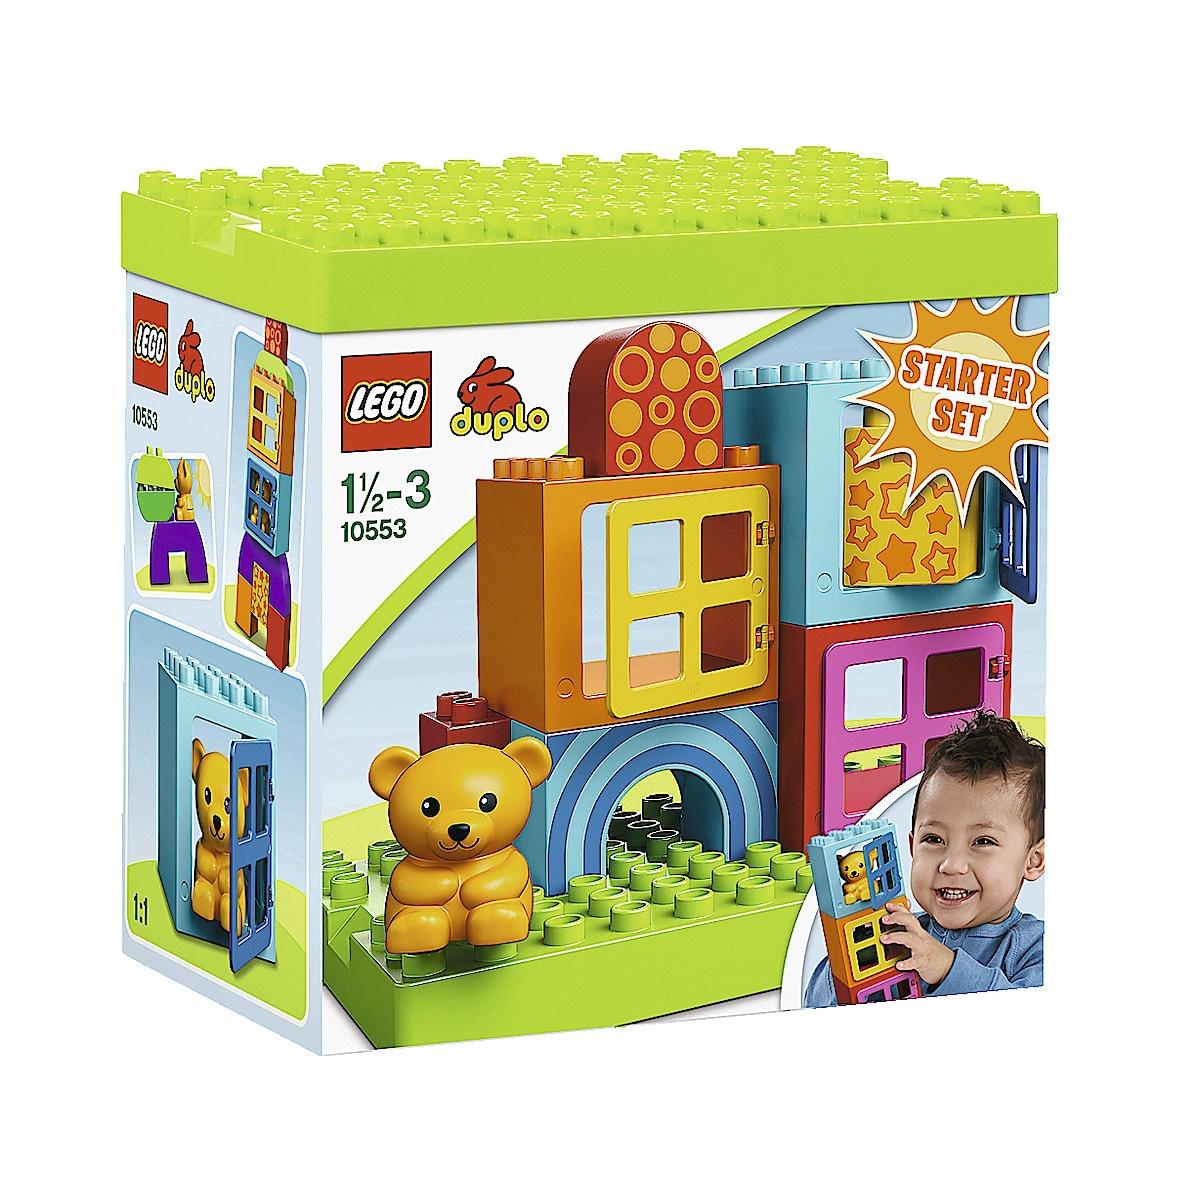 Rakenna ja leiki Lego Duplo